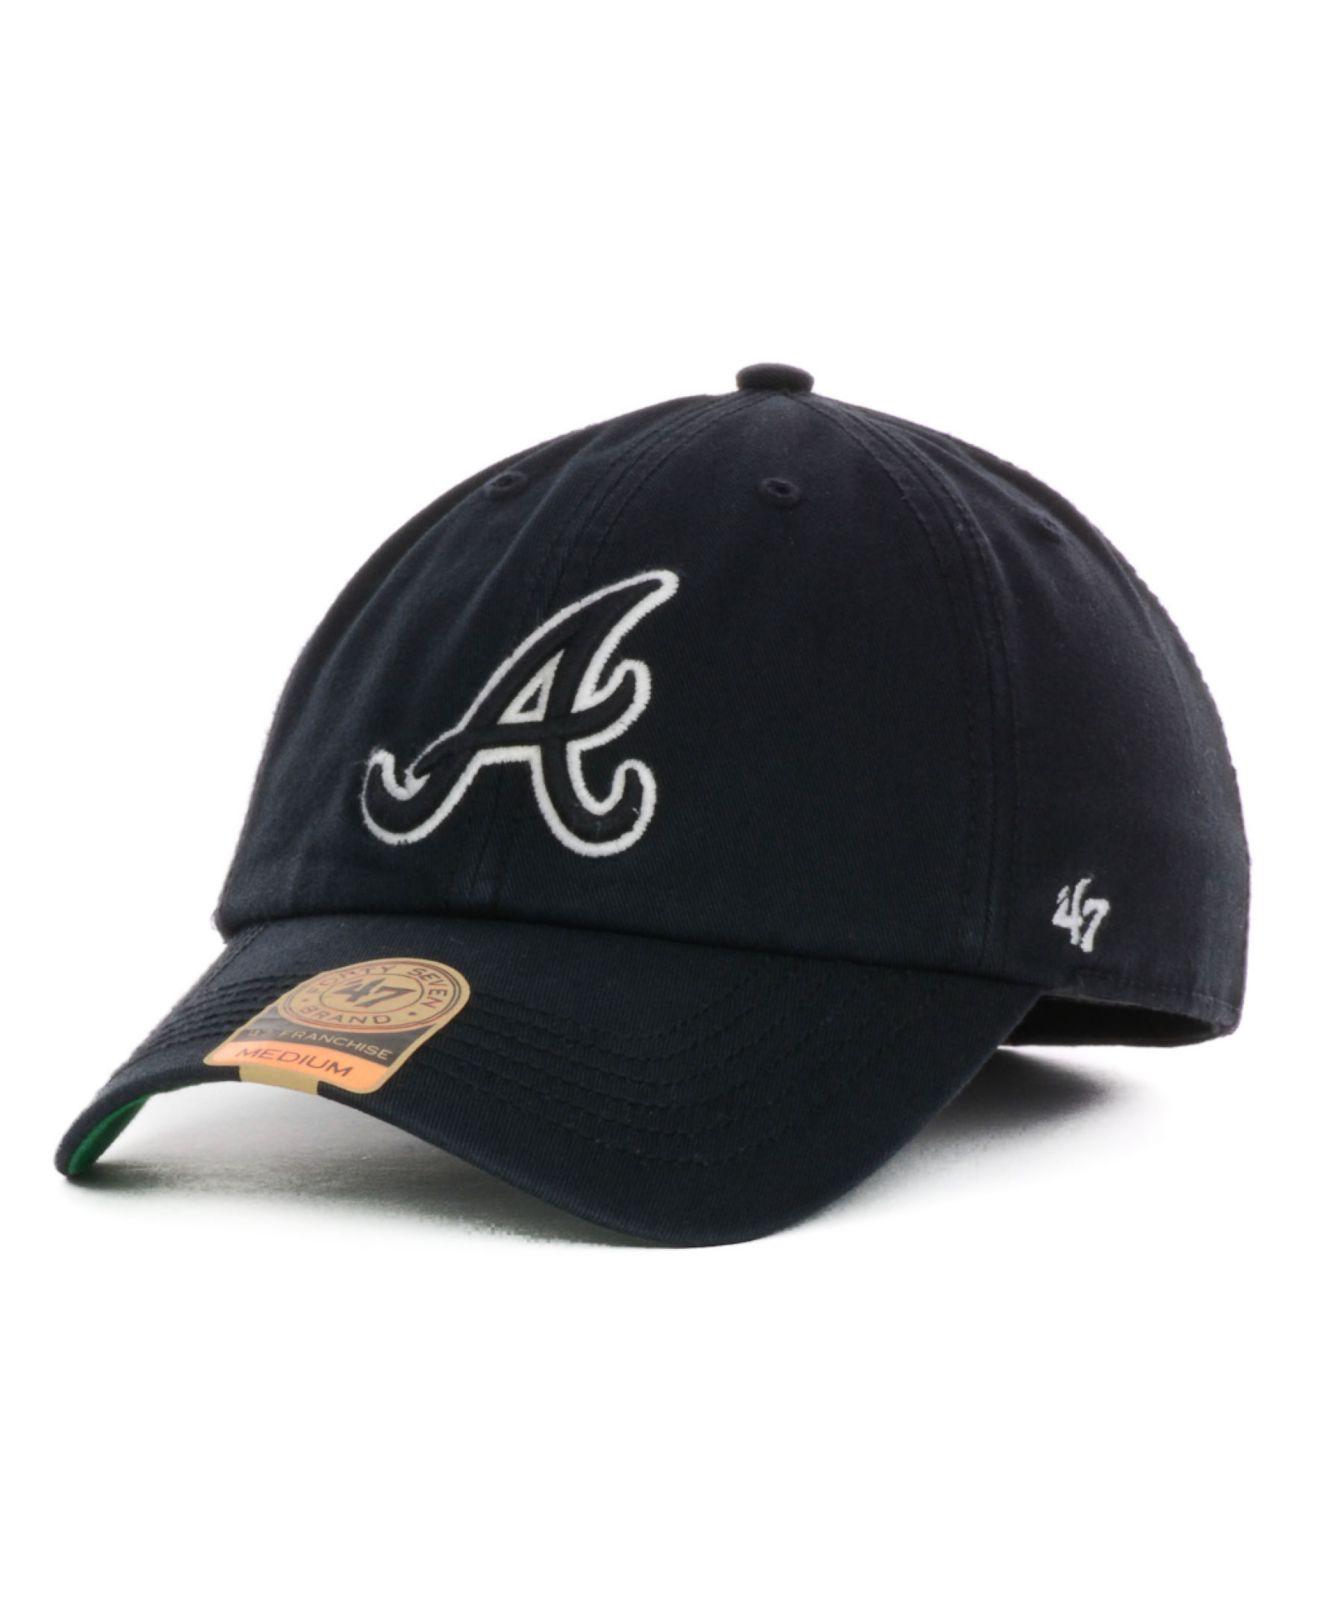 47 Brand Atlanta Braves Lights Out Franchise Cap In Black